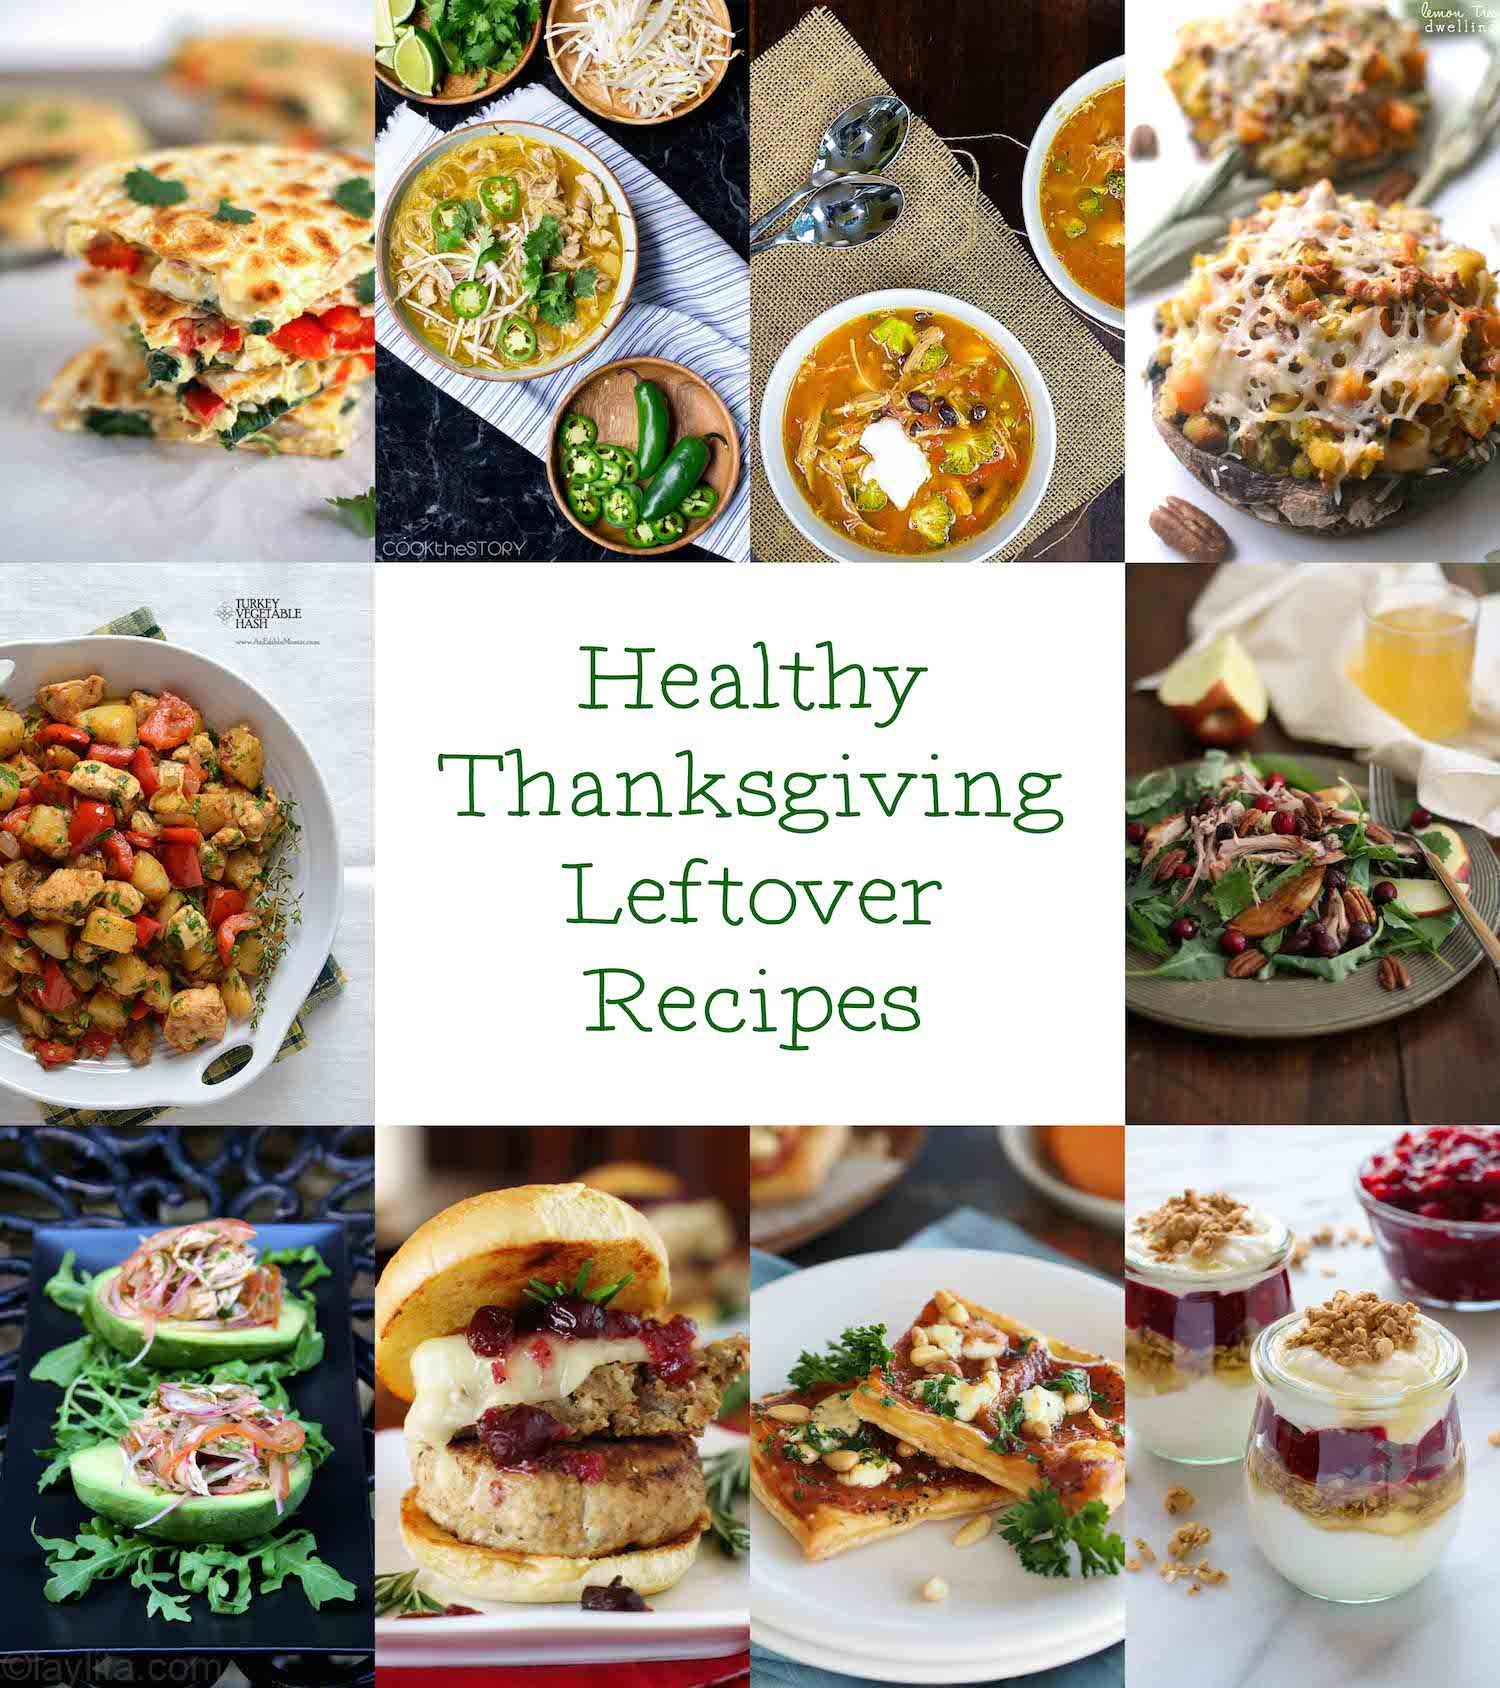 Healthy Thanksgiving Turkey Recipes  20 Healthy Thanksgiving Leftover Recipes A Healthy Life